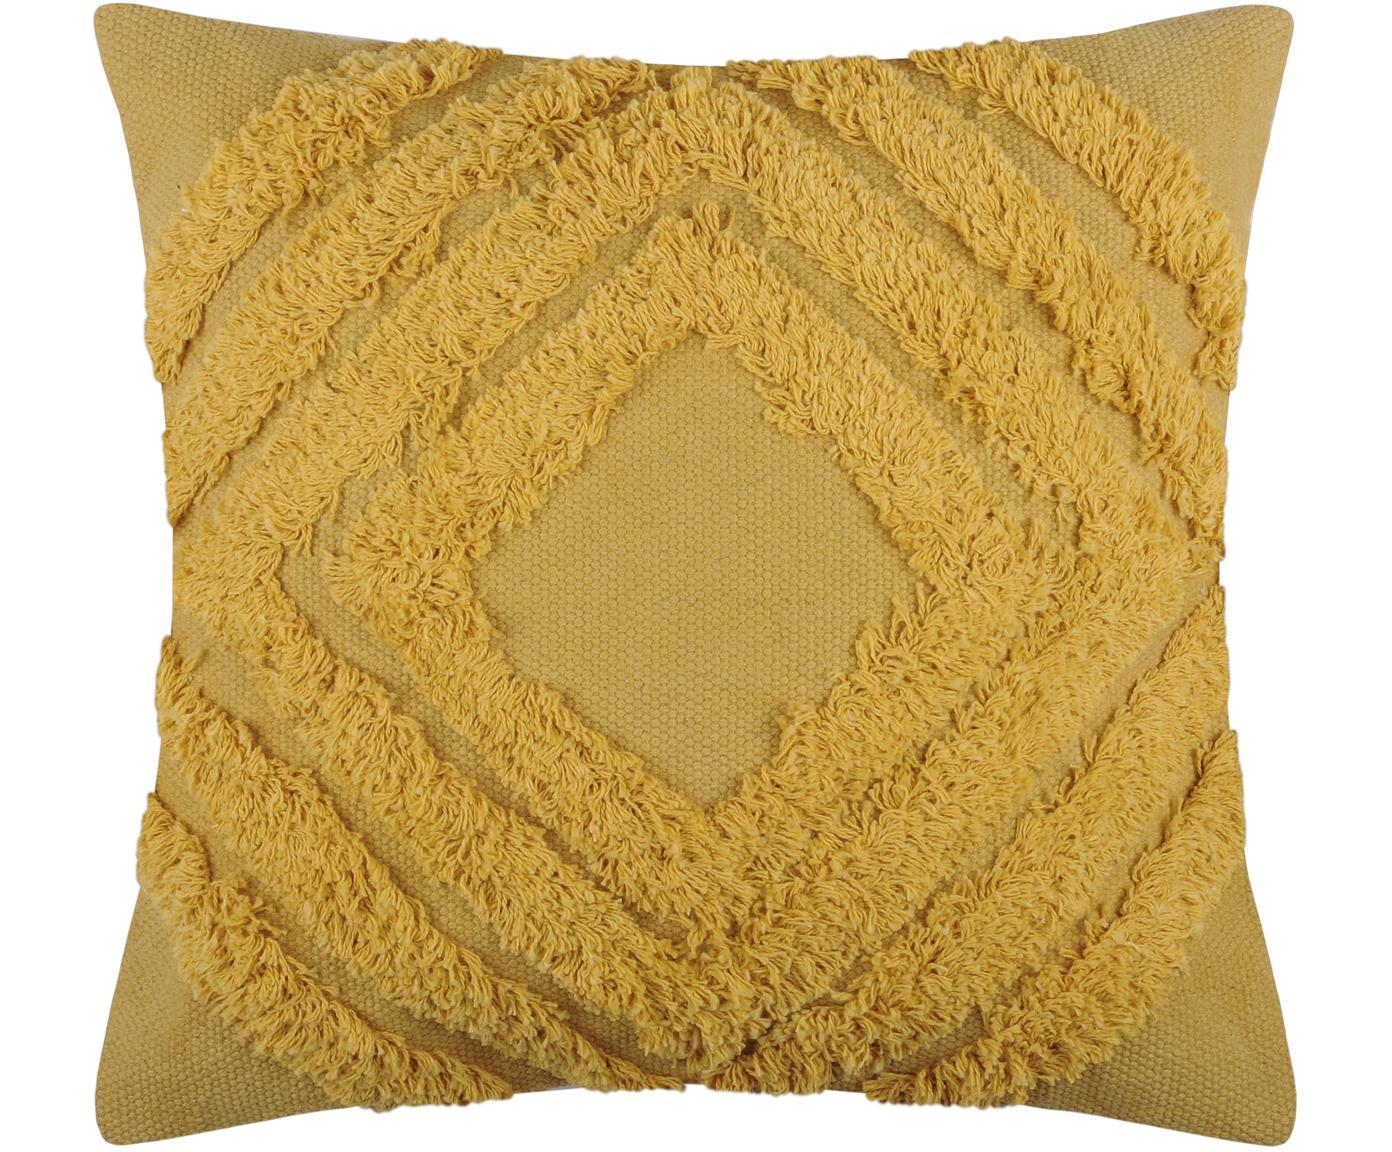 Cojín Greenmood, estilo boho, con relleno, Funda: 100%algodón, Amarillo, An 40 x L 40 cm